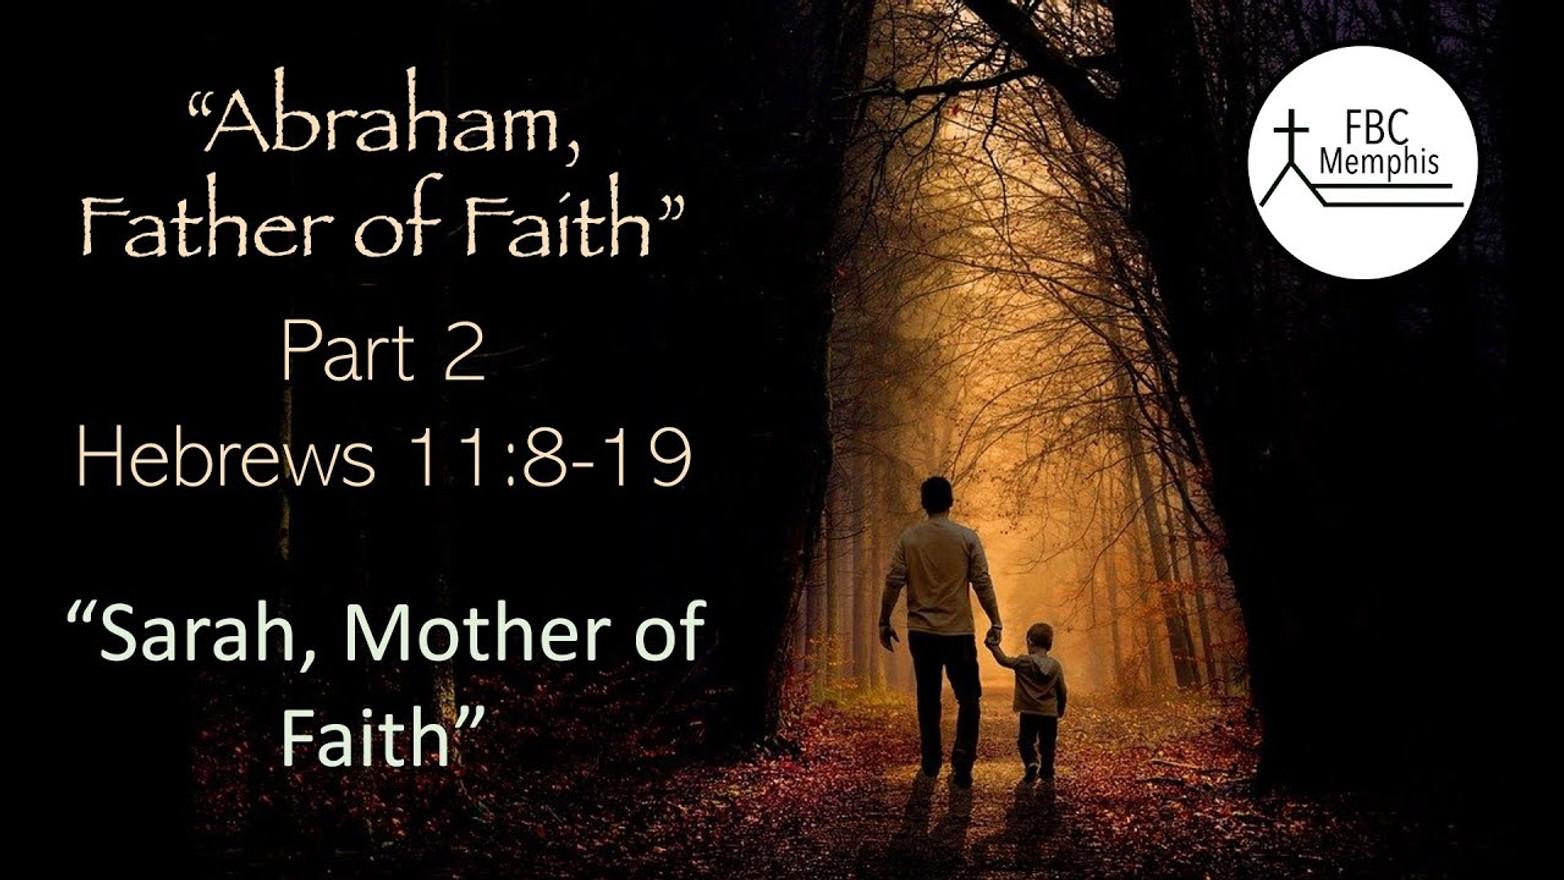 Abraham Father Of Faith (Part 2)